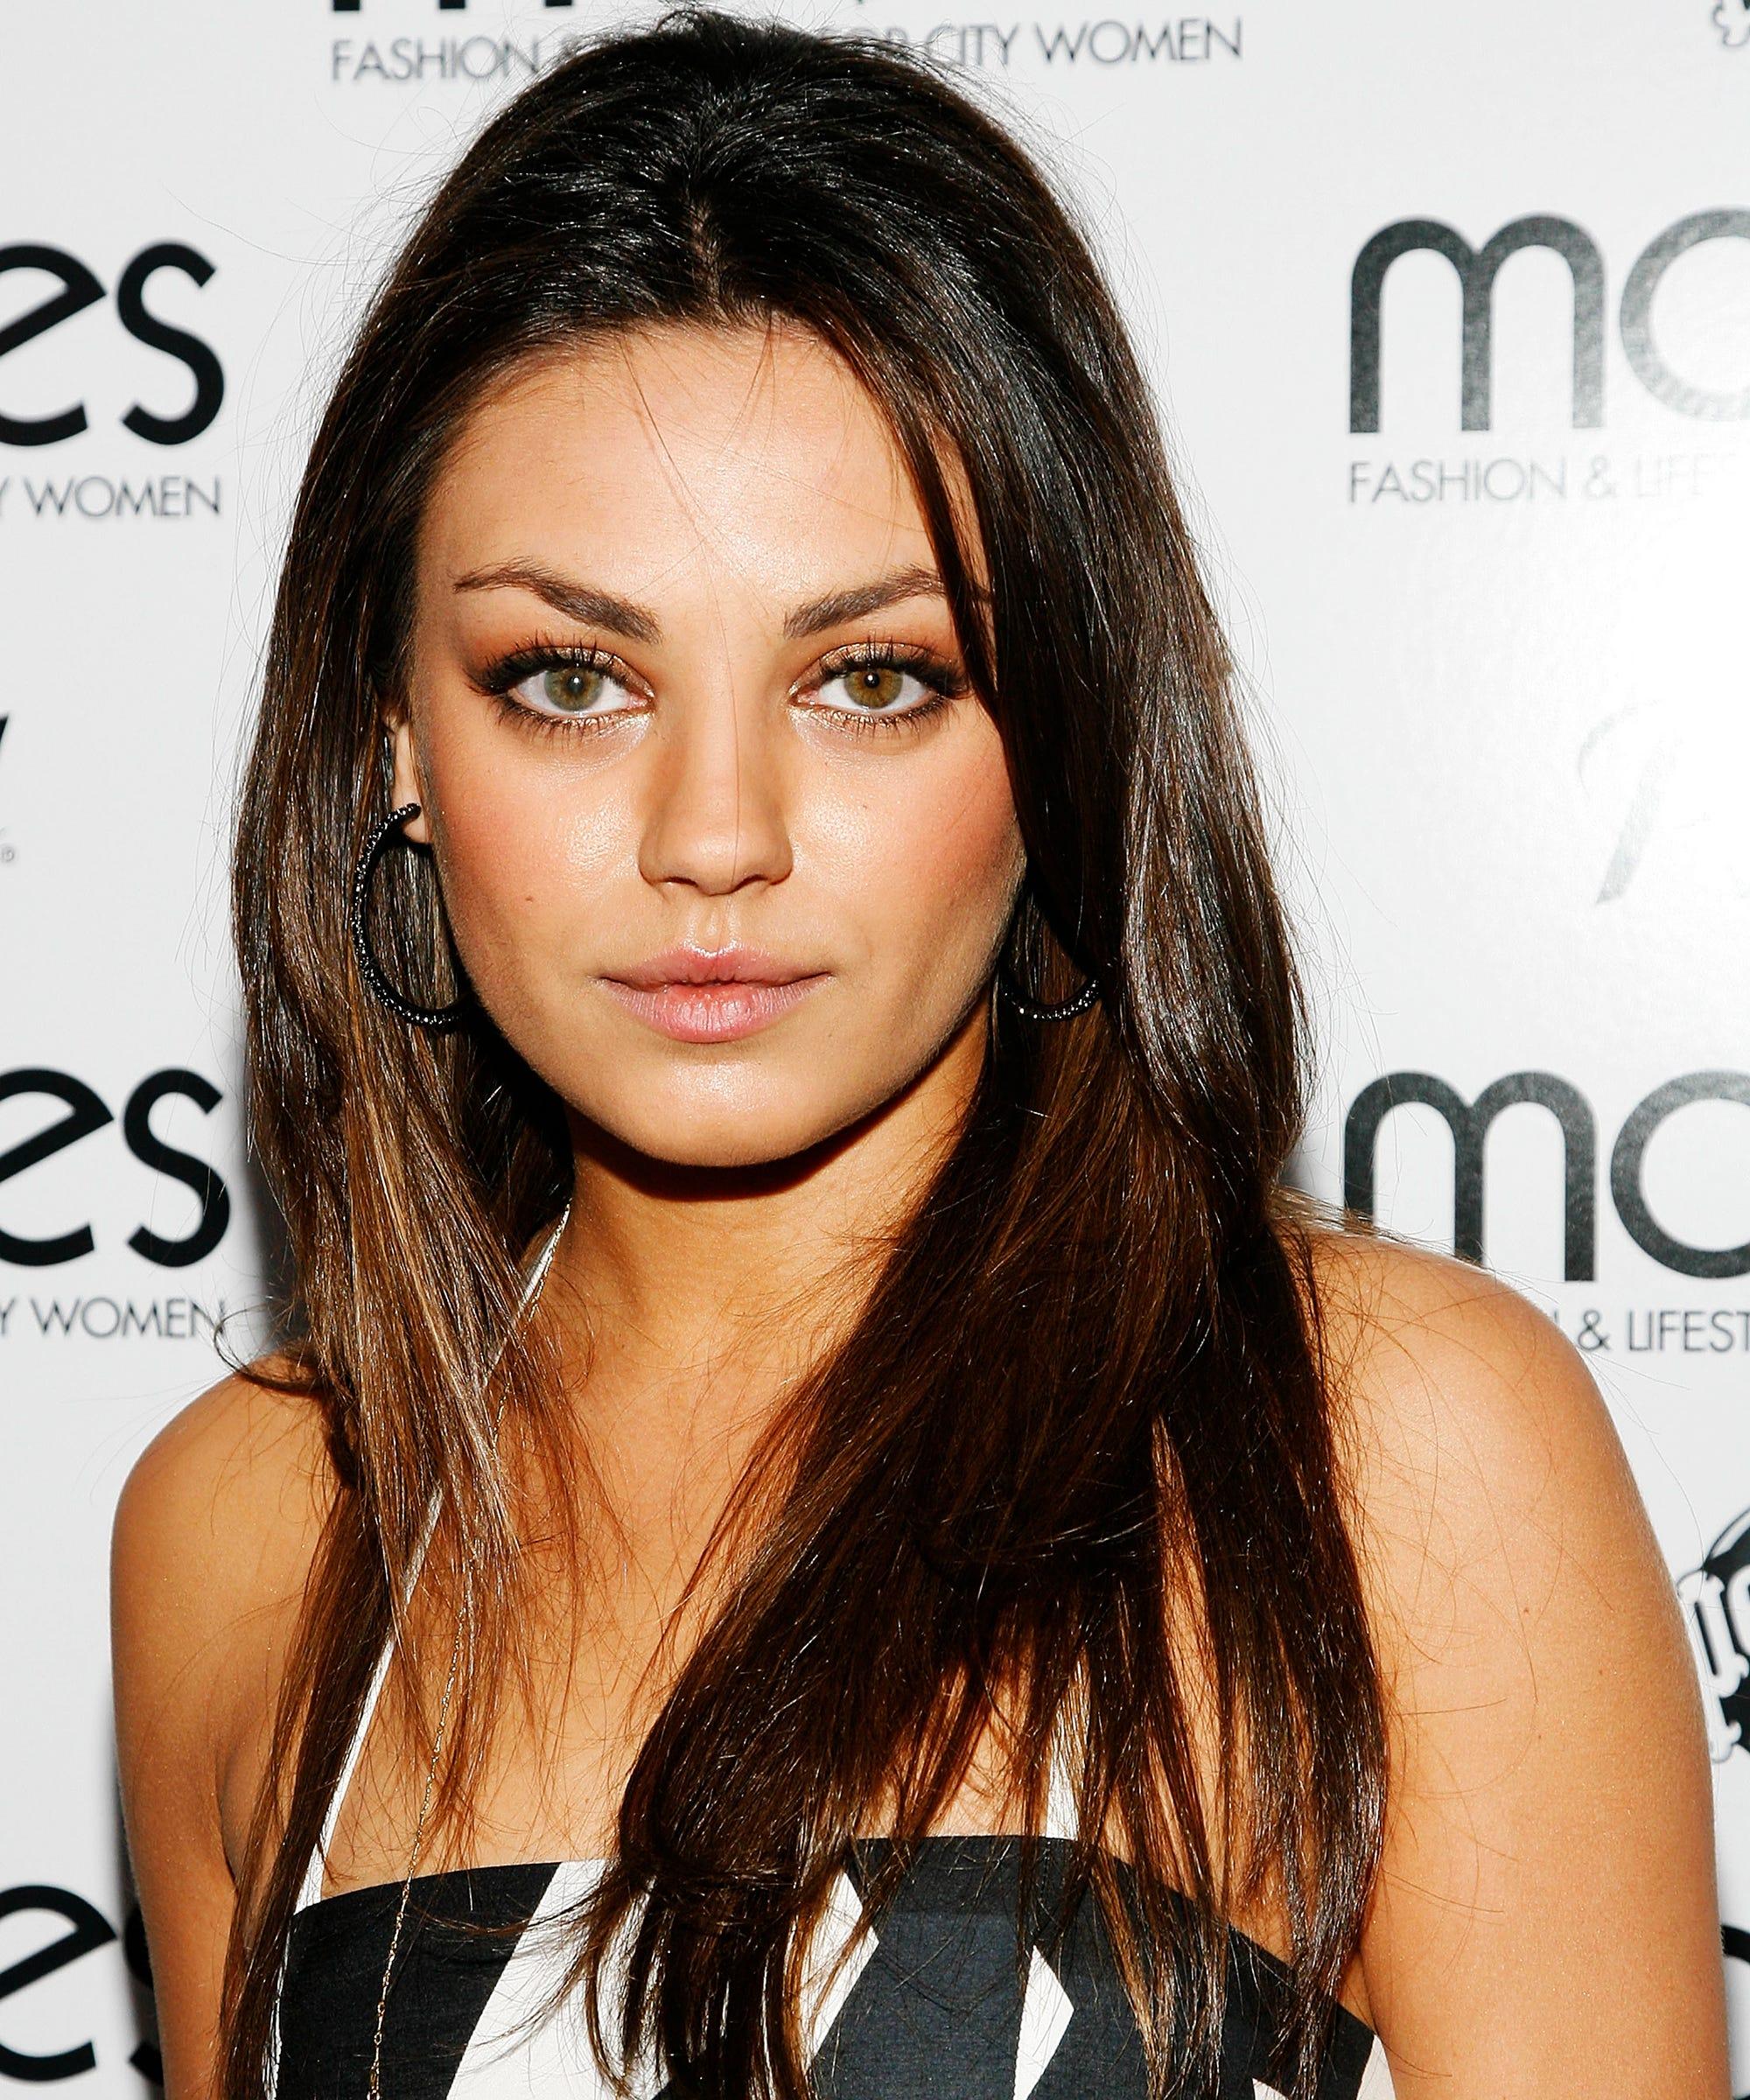 Mila Kunis Best Beauty Hair Makeup Looks Over The Years